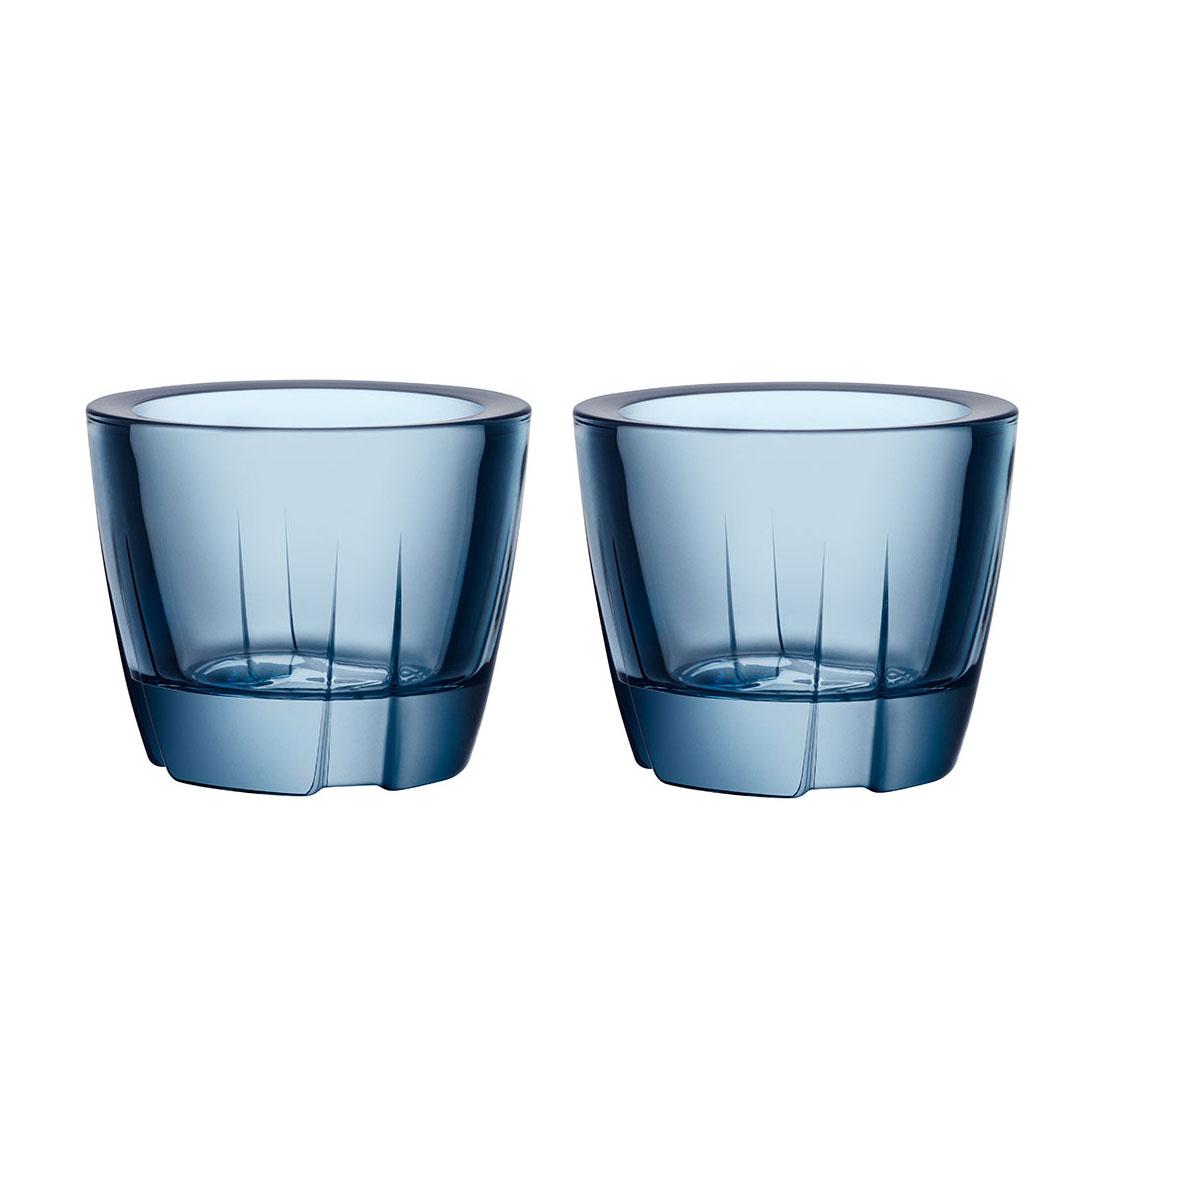 Kosta Boda Bruk Crystal Votive Water Blue Anything Crystal Bowl, Pair